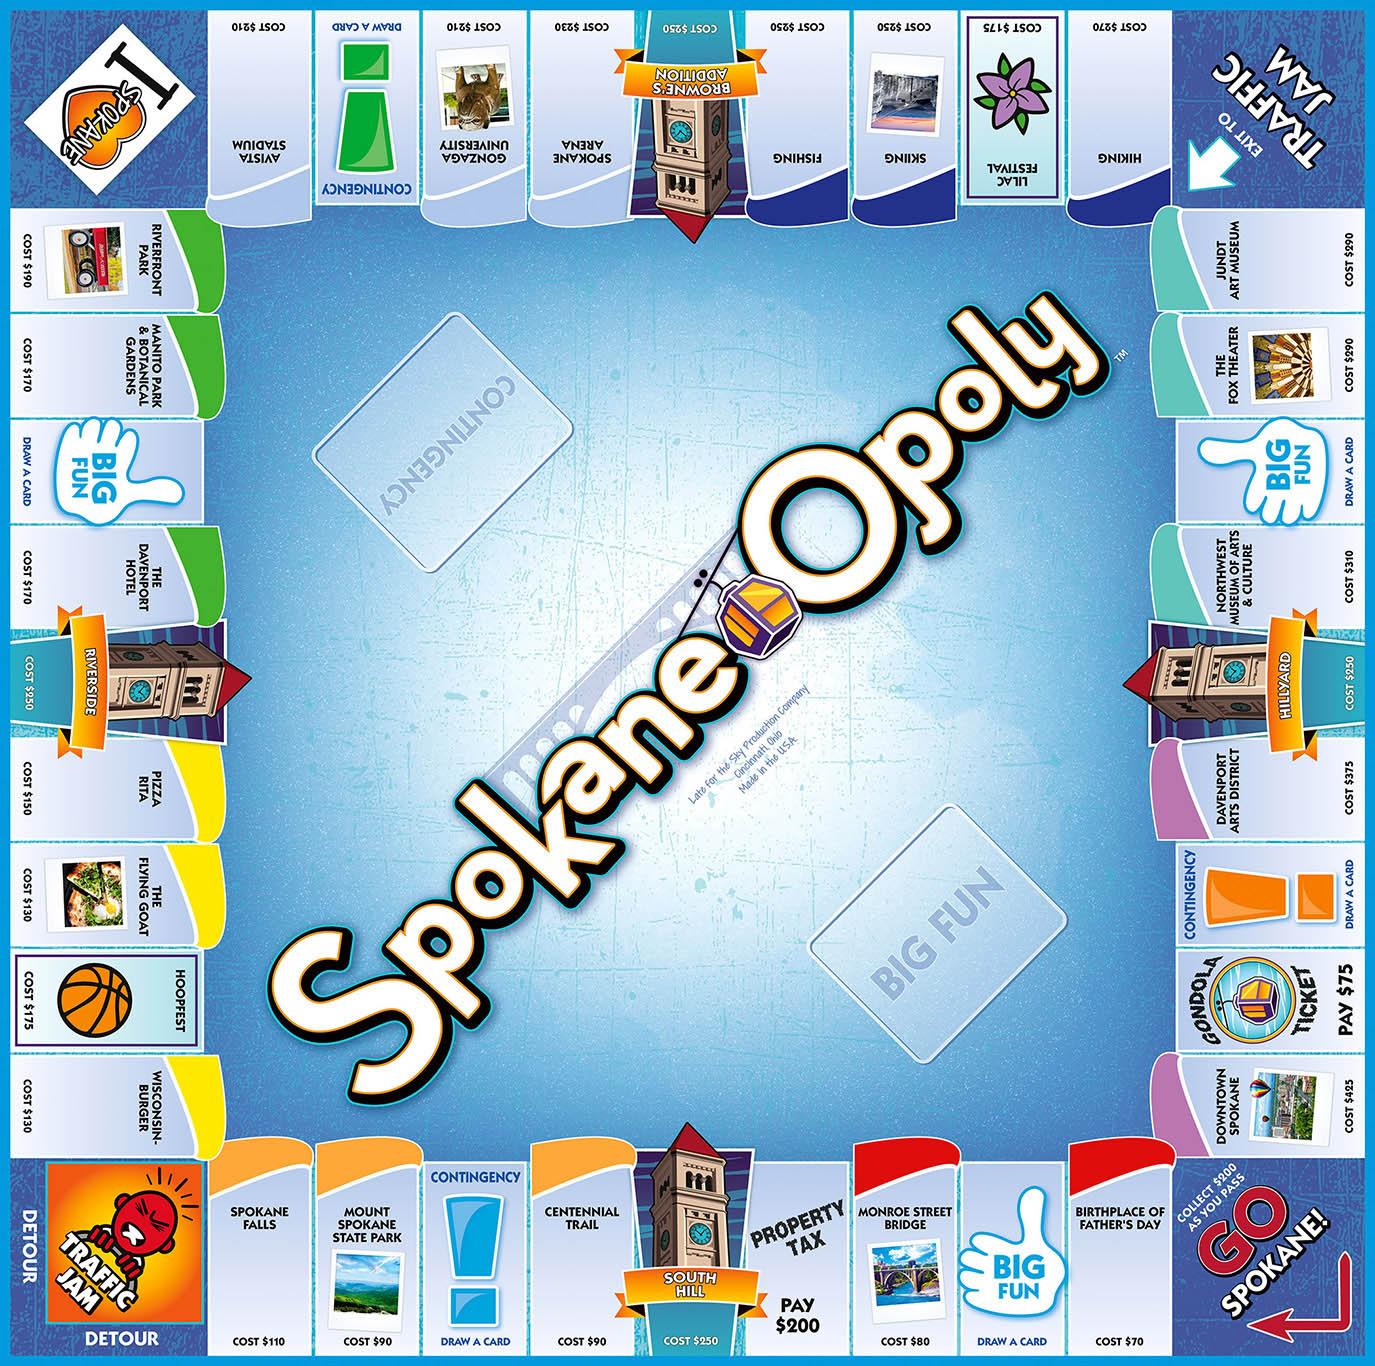 SPOKANE-OPOLY Board Game